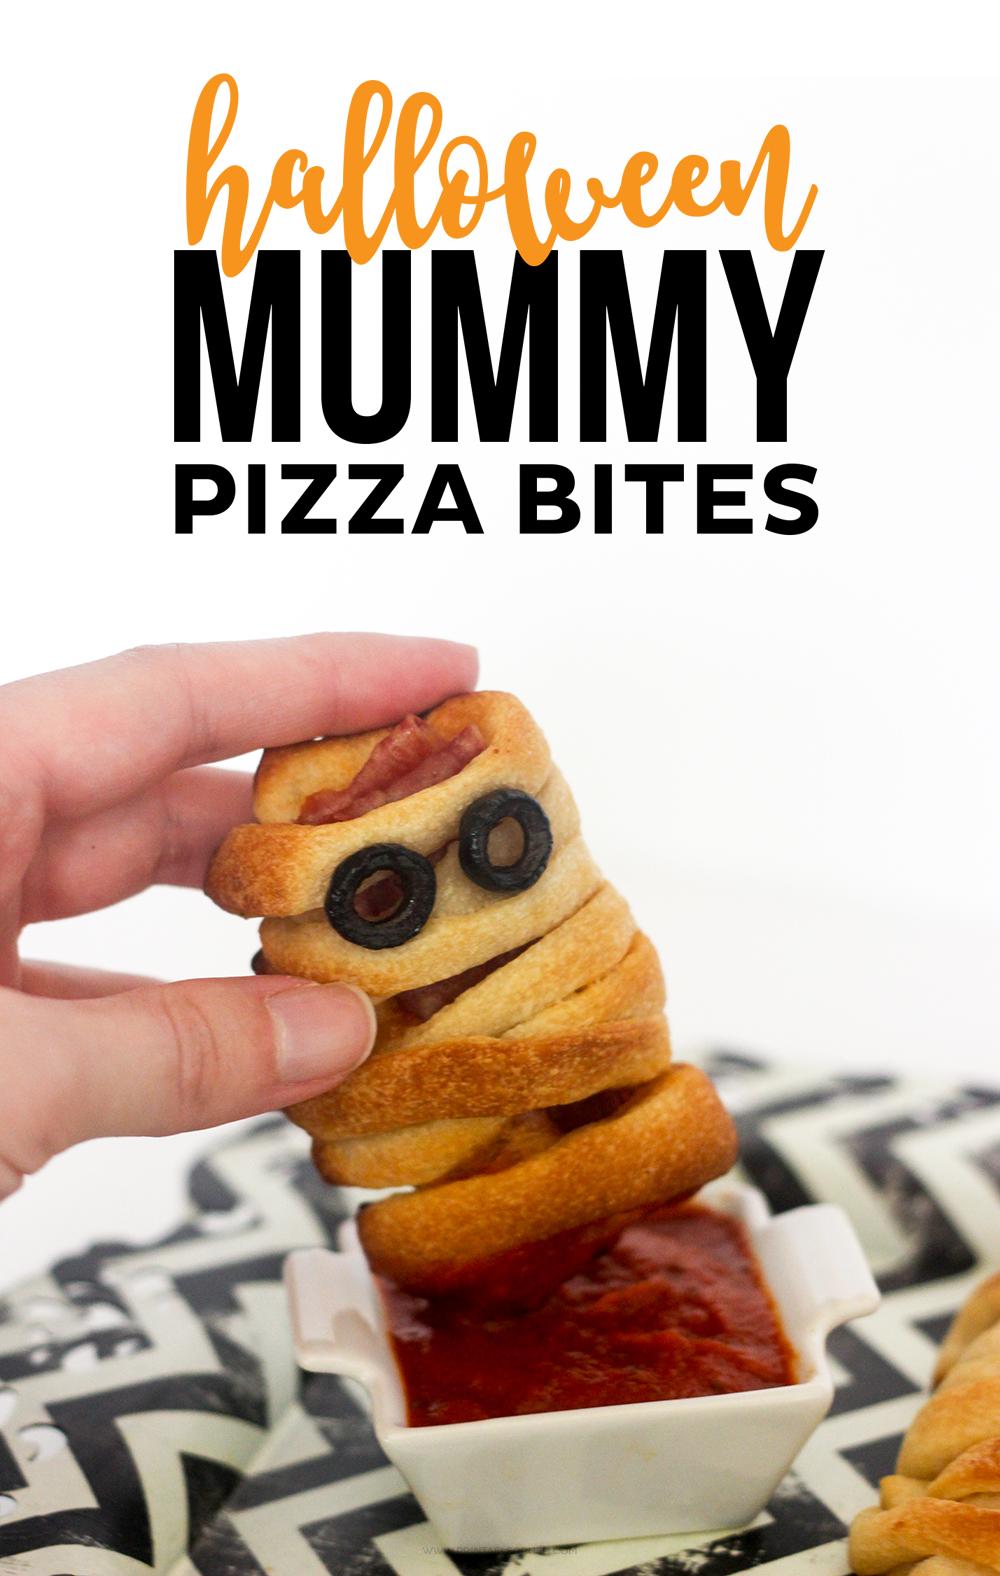 Halloween Pizza Mummy Bites